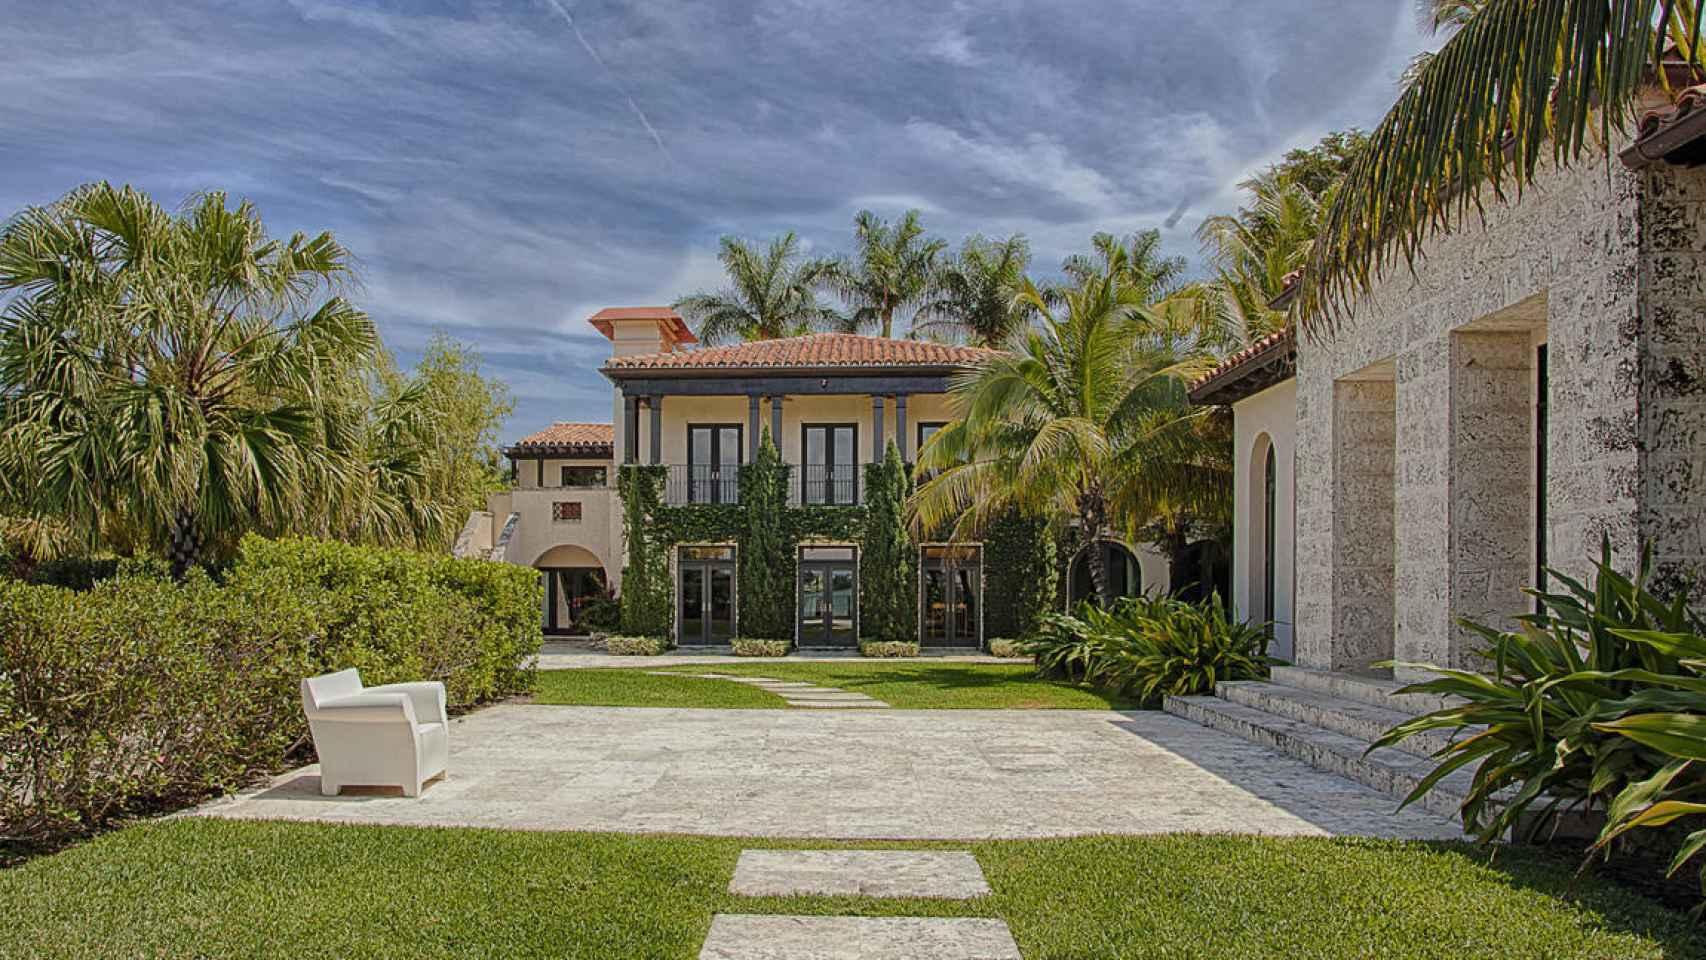 La mansión de lujo que vende Matt Damon en Miami